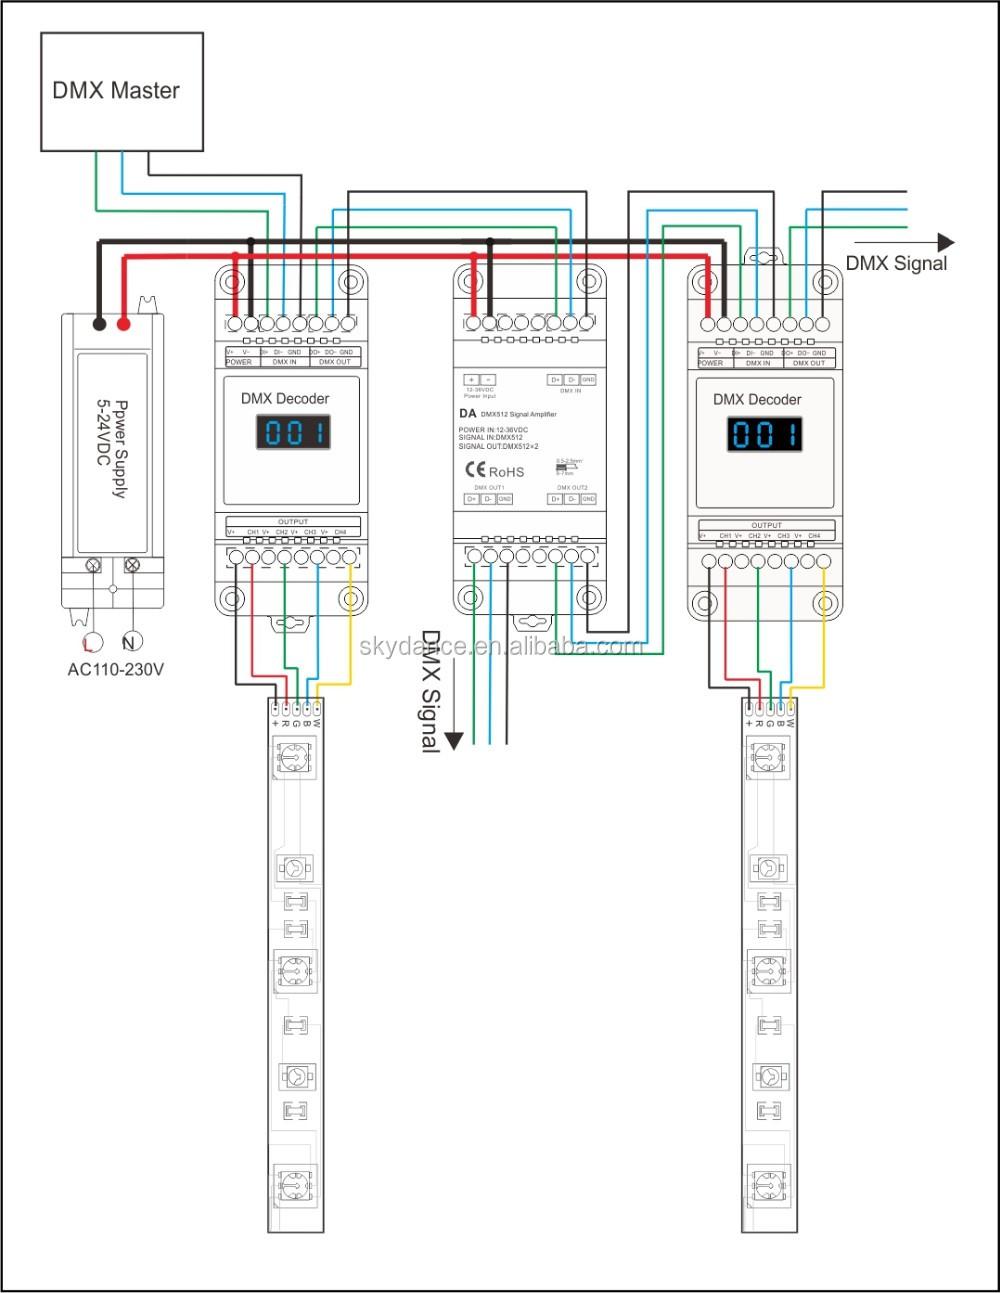 Dmx Splitter Diagram Electrical Wiring Diagrams Hot Sale Din Rail Mounted Wireless 2 Ch Da 1